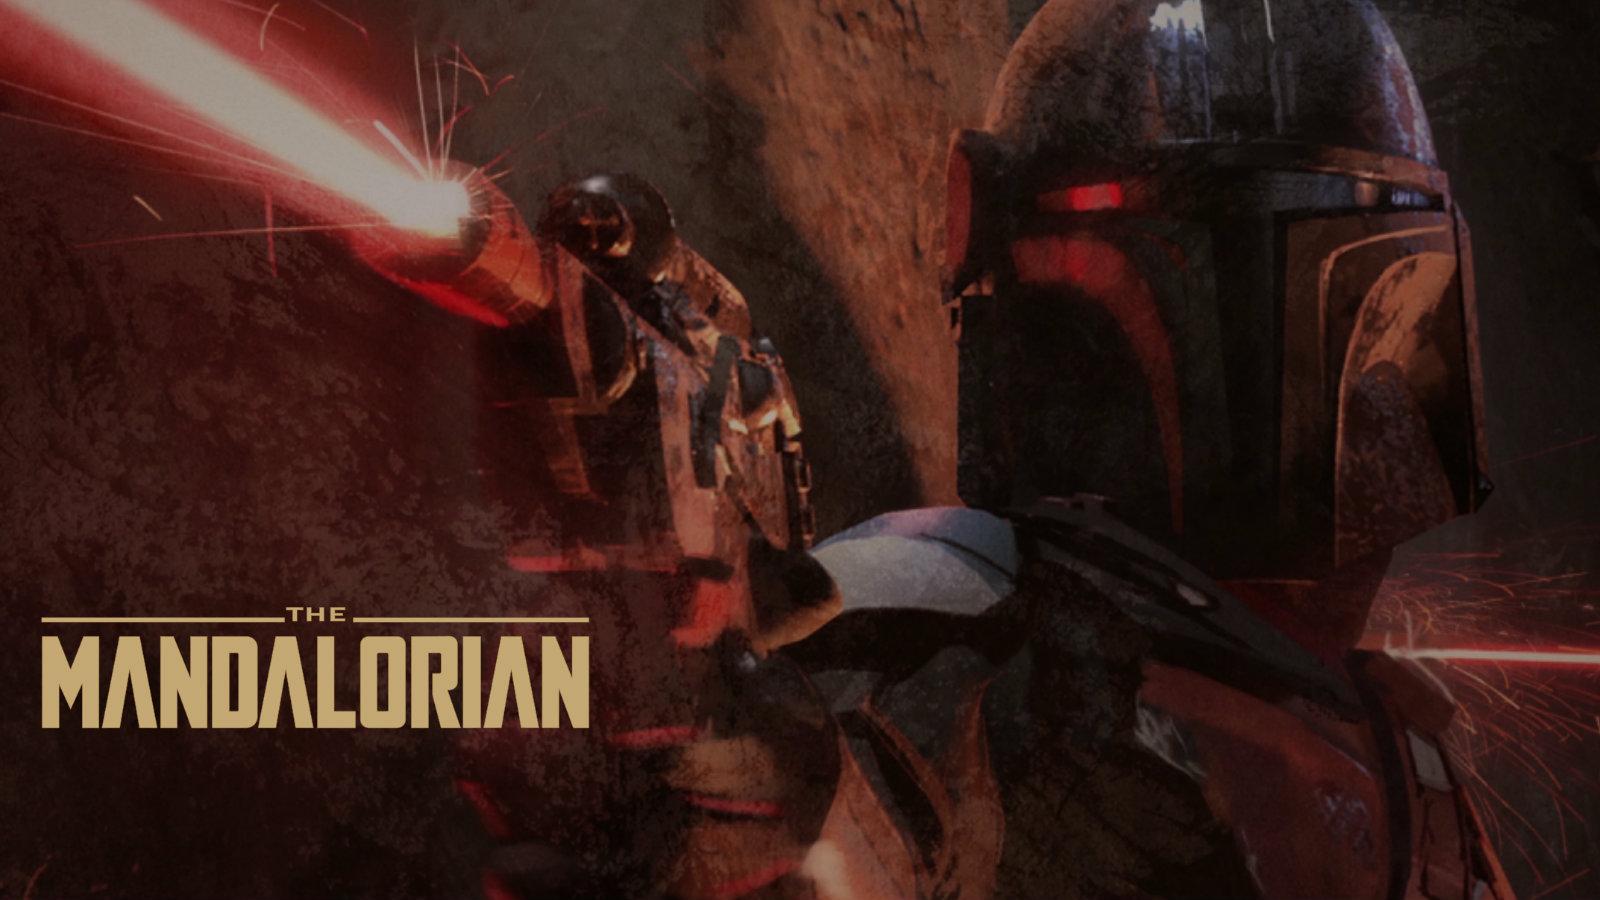 The Mandalorian Season One Star Wars Wallpaper 43208553 Fanpop